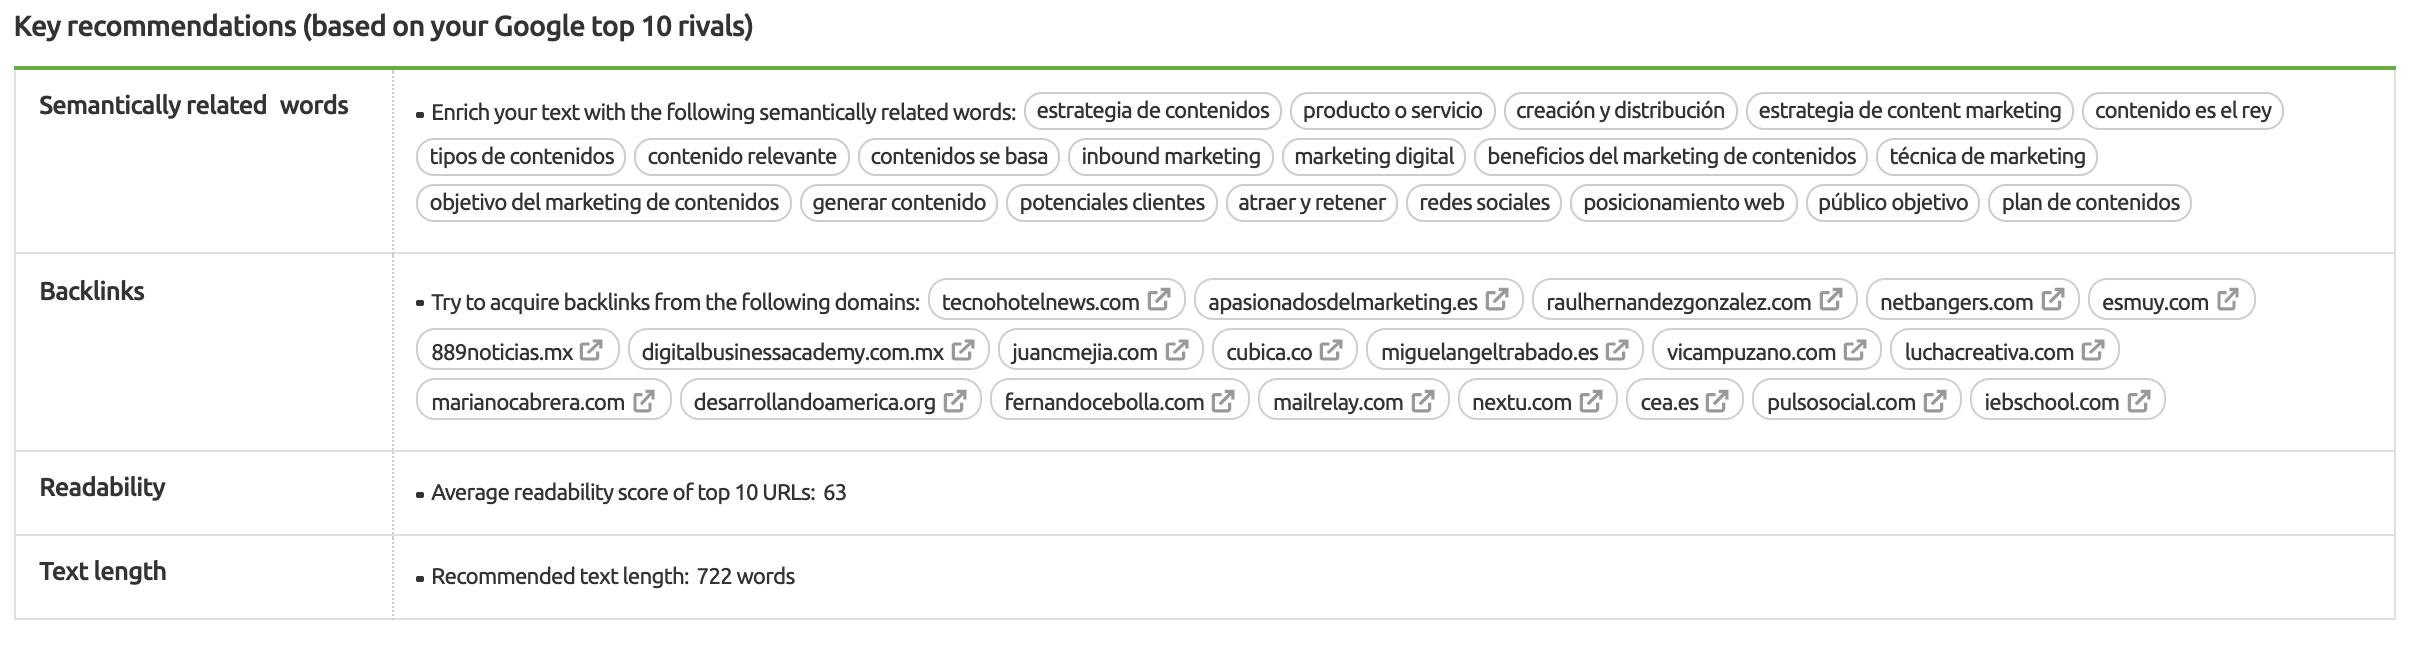 Cómo usar SEMrush para marketing de contenidos. Imagen 15